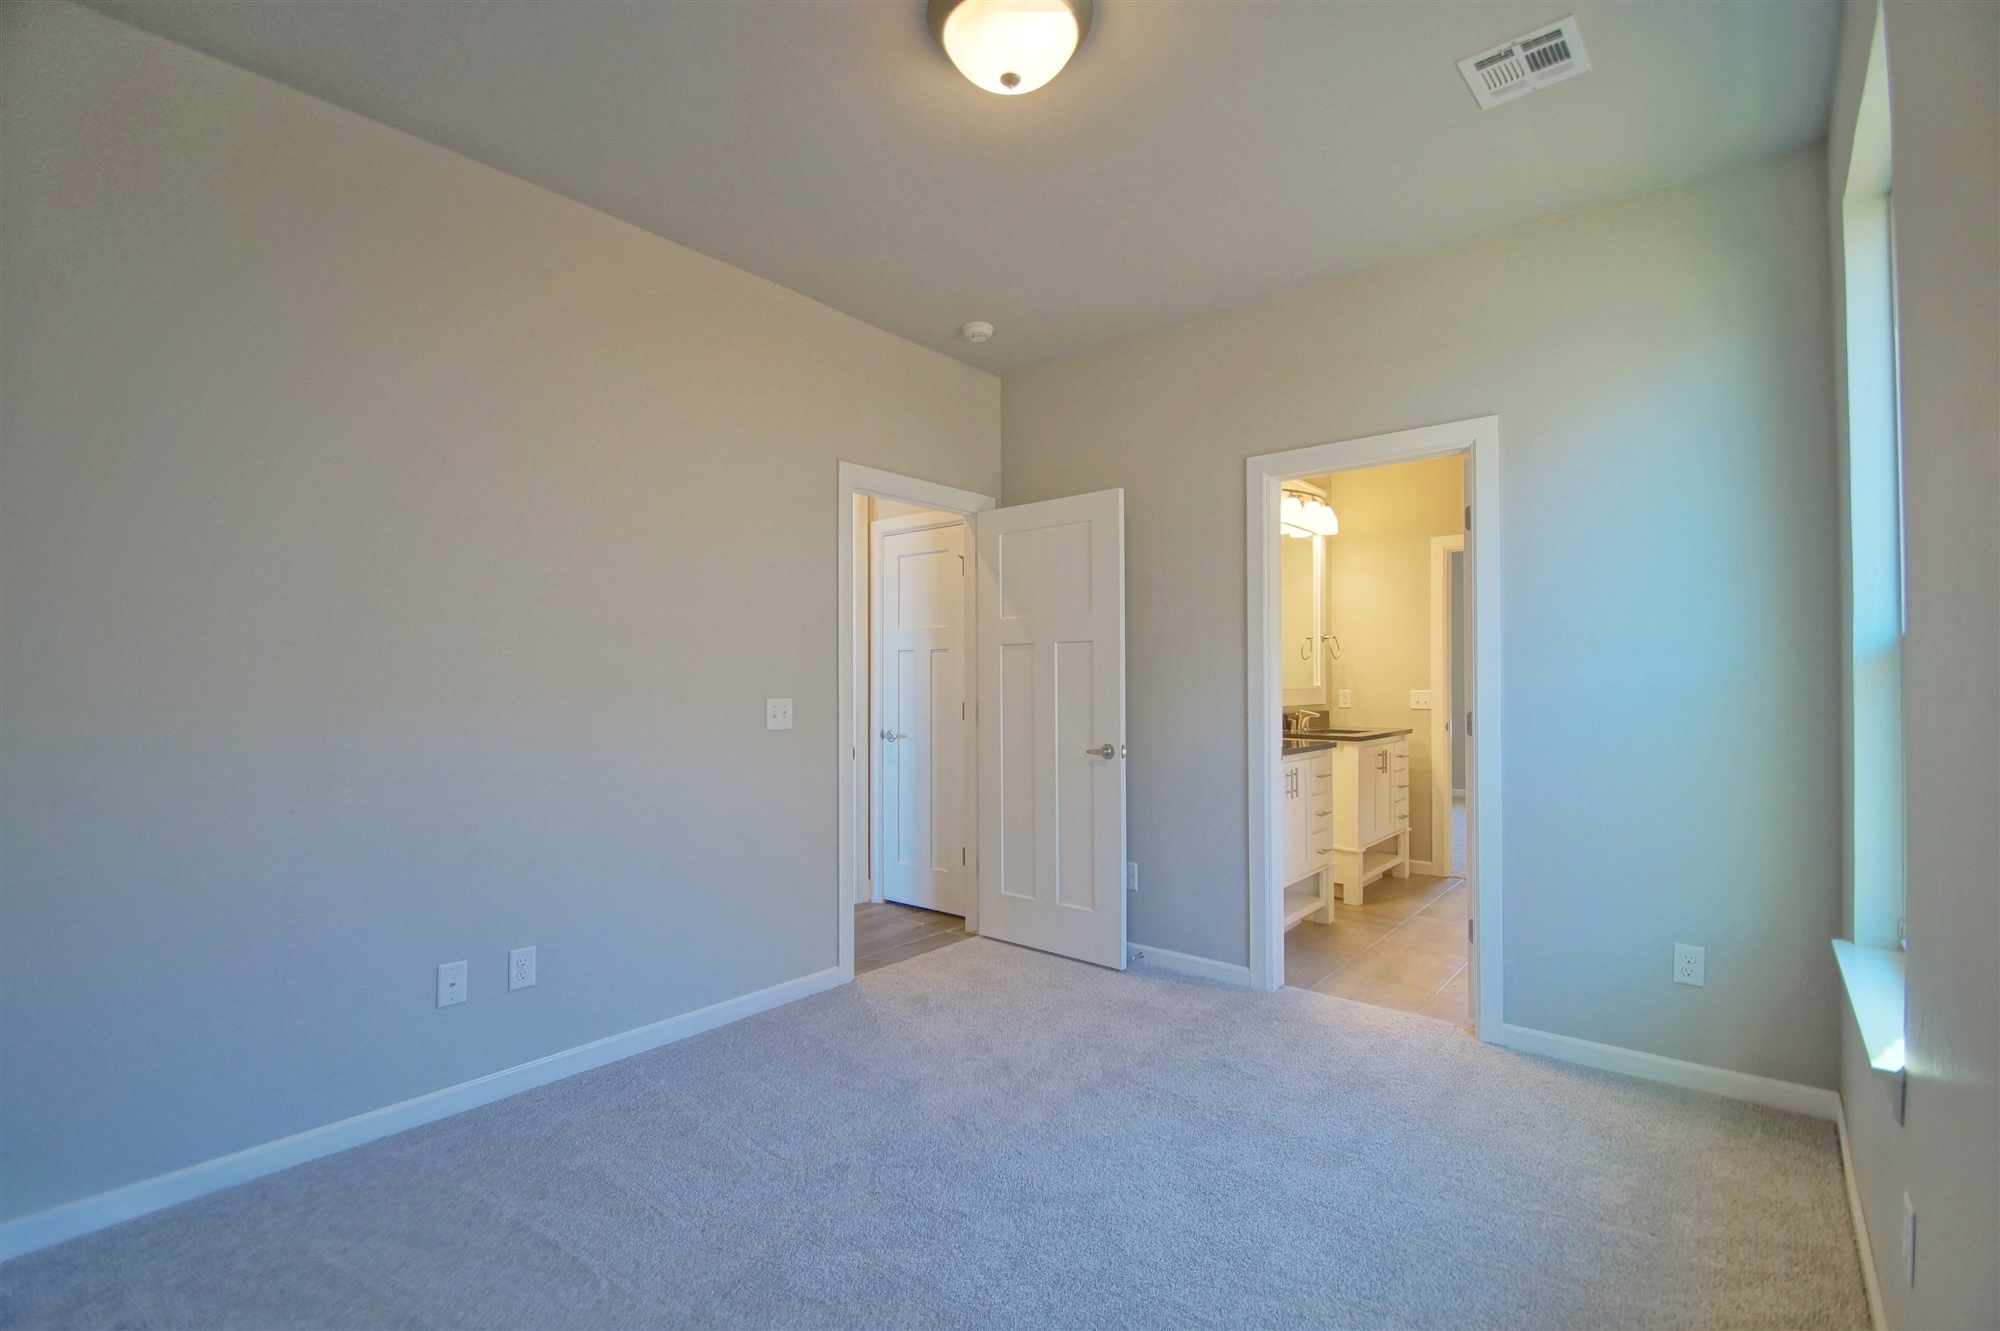 27 - Bedroom.jpg